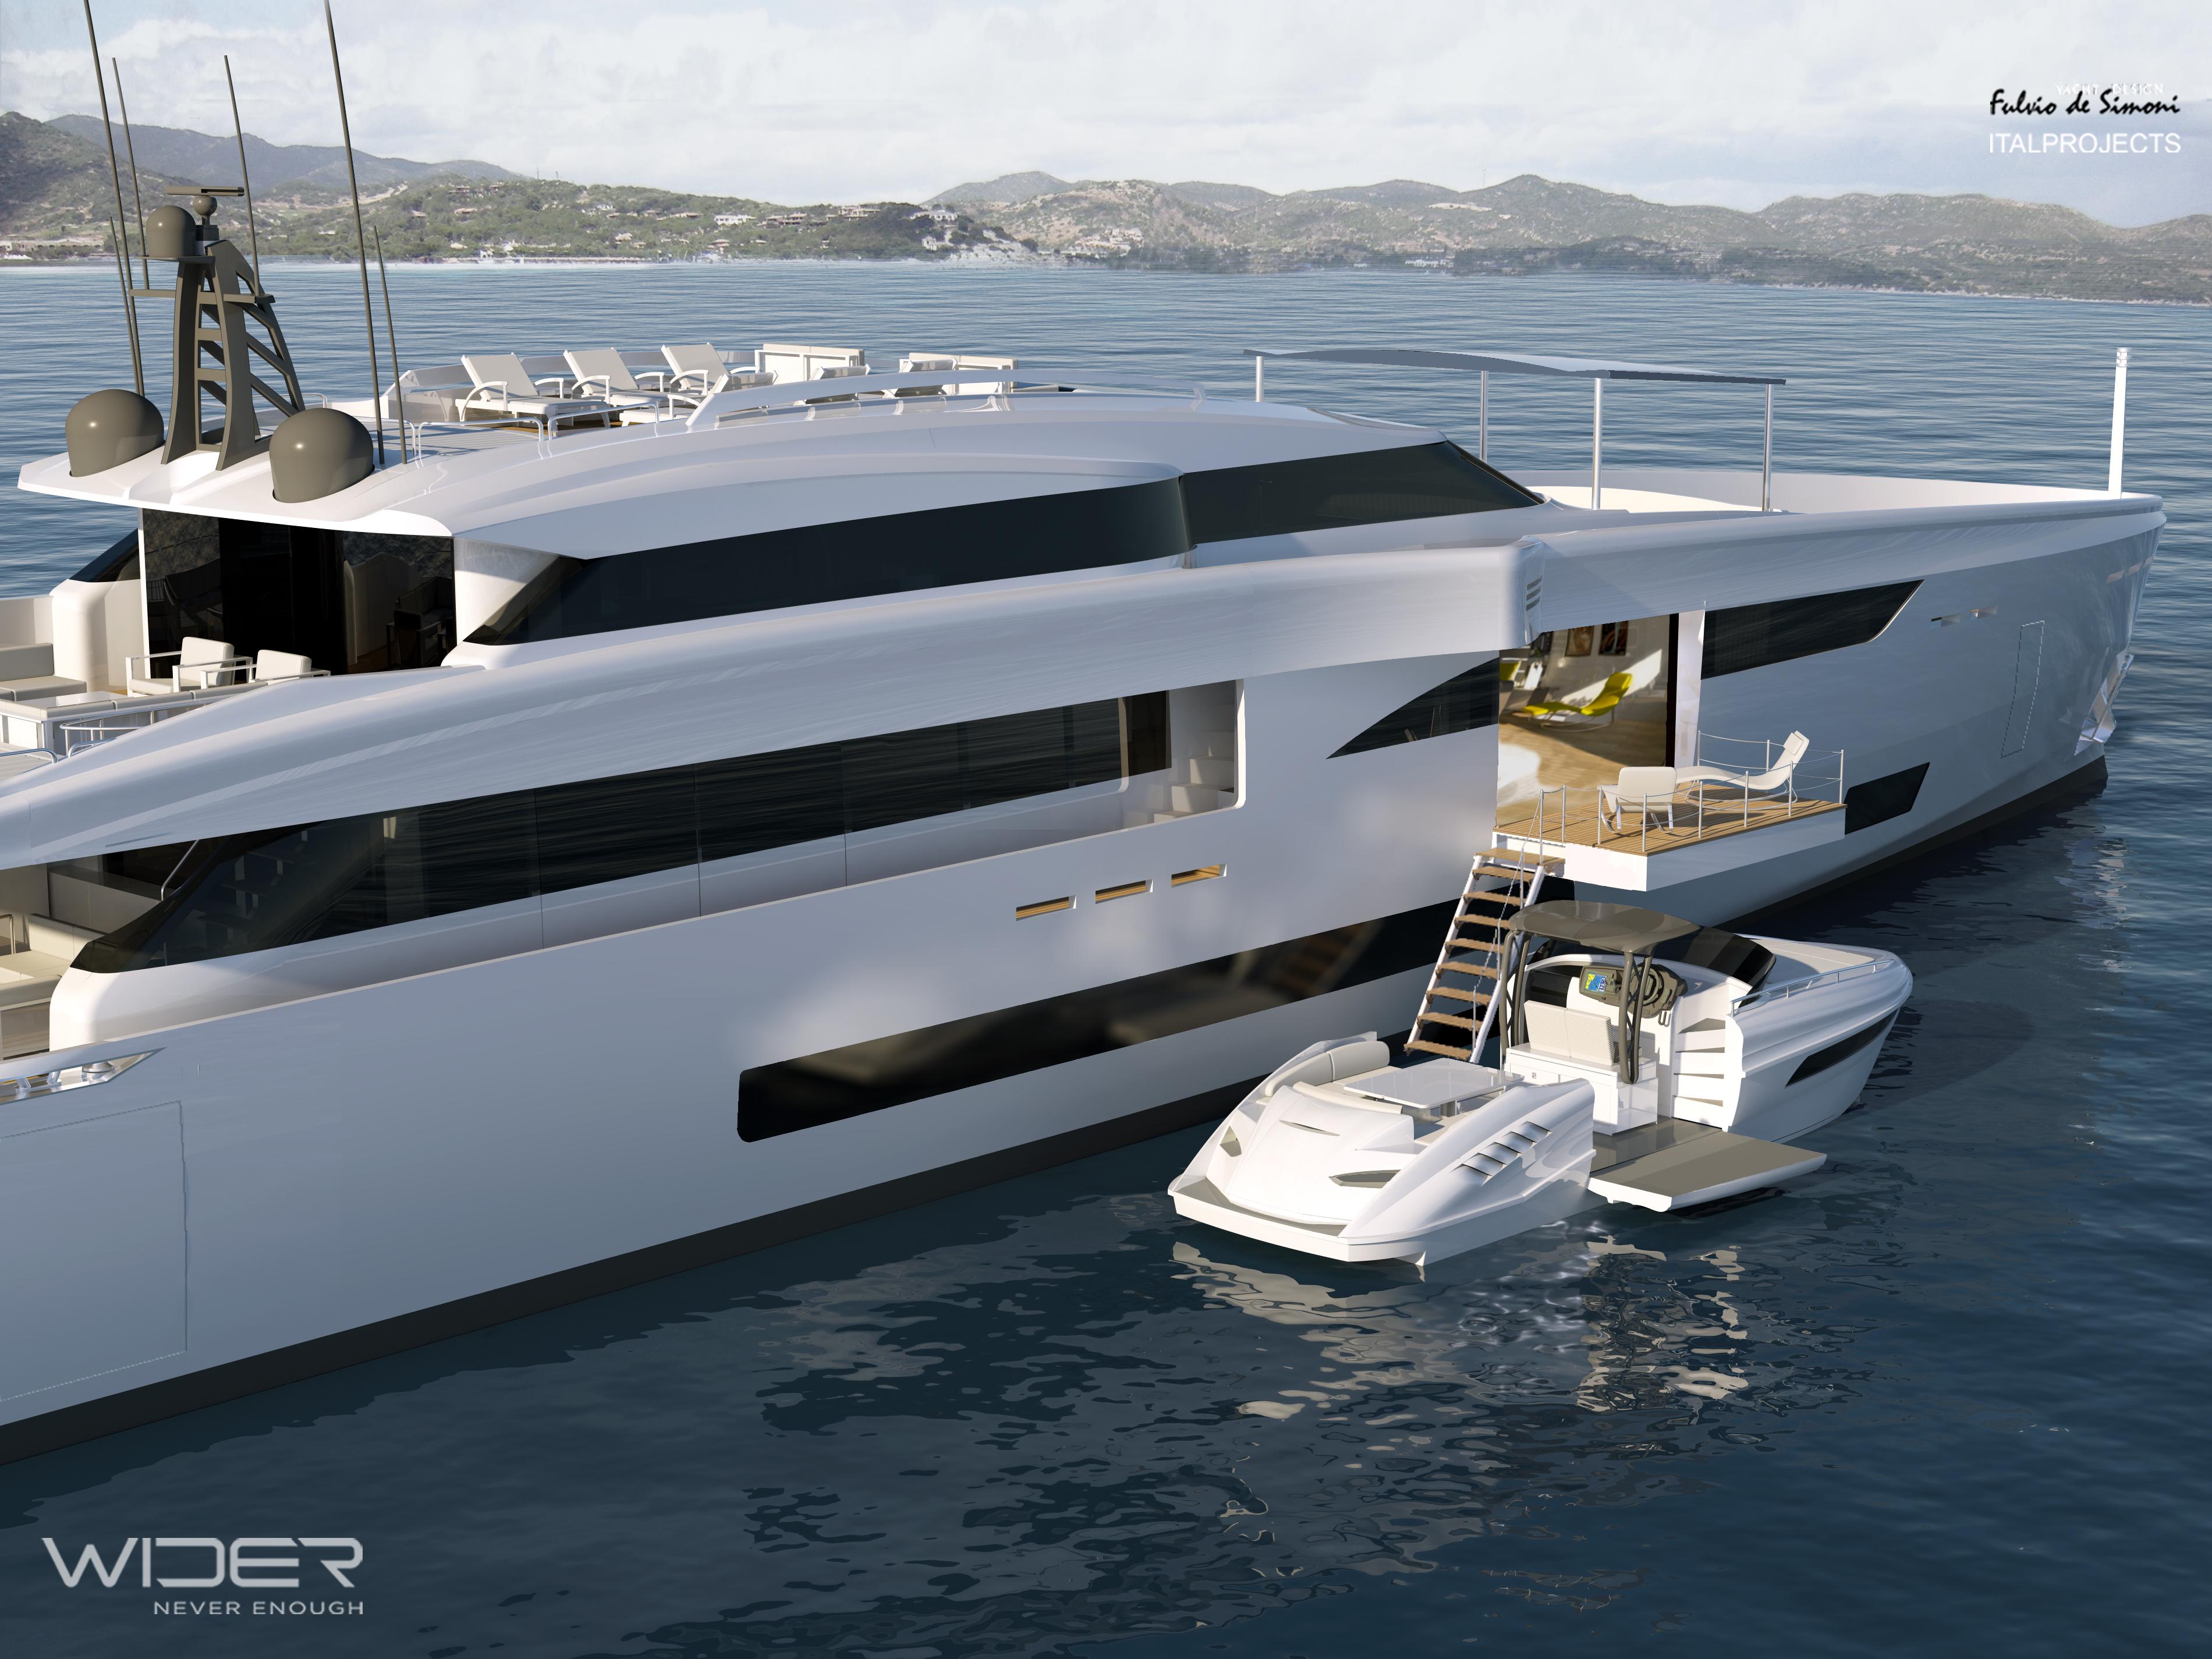 Wider 150 superyacht with a 33' Wider yacht tender